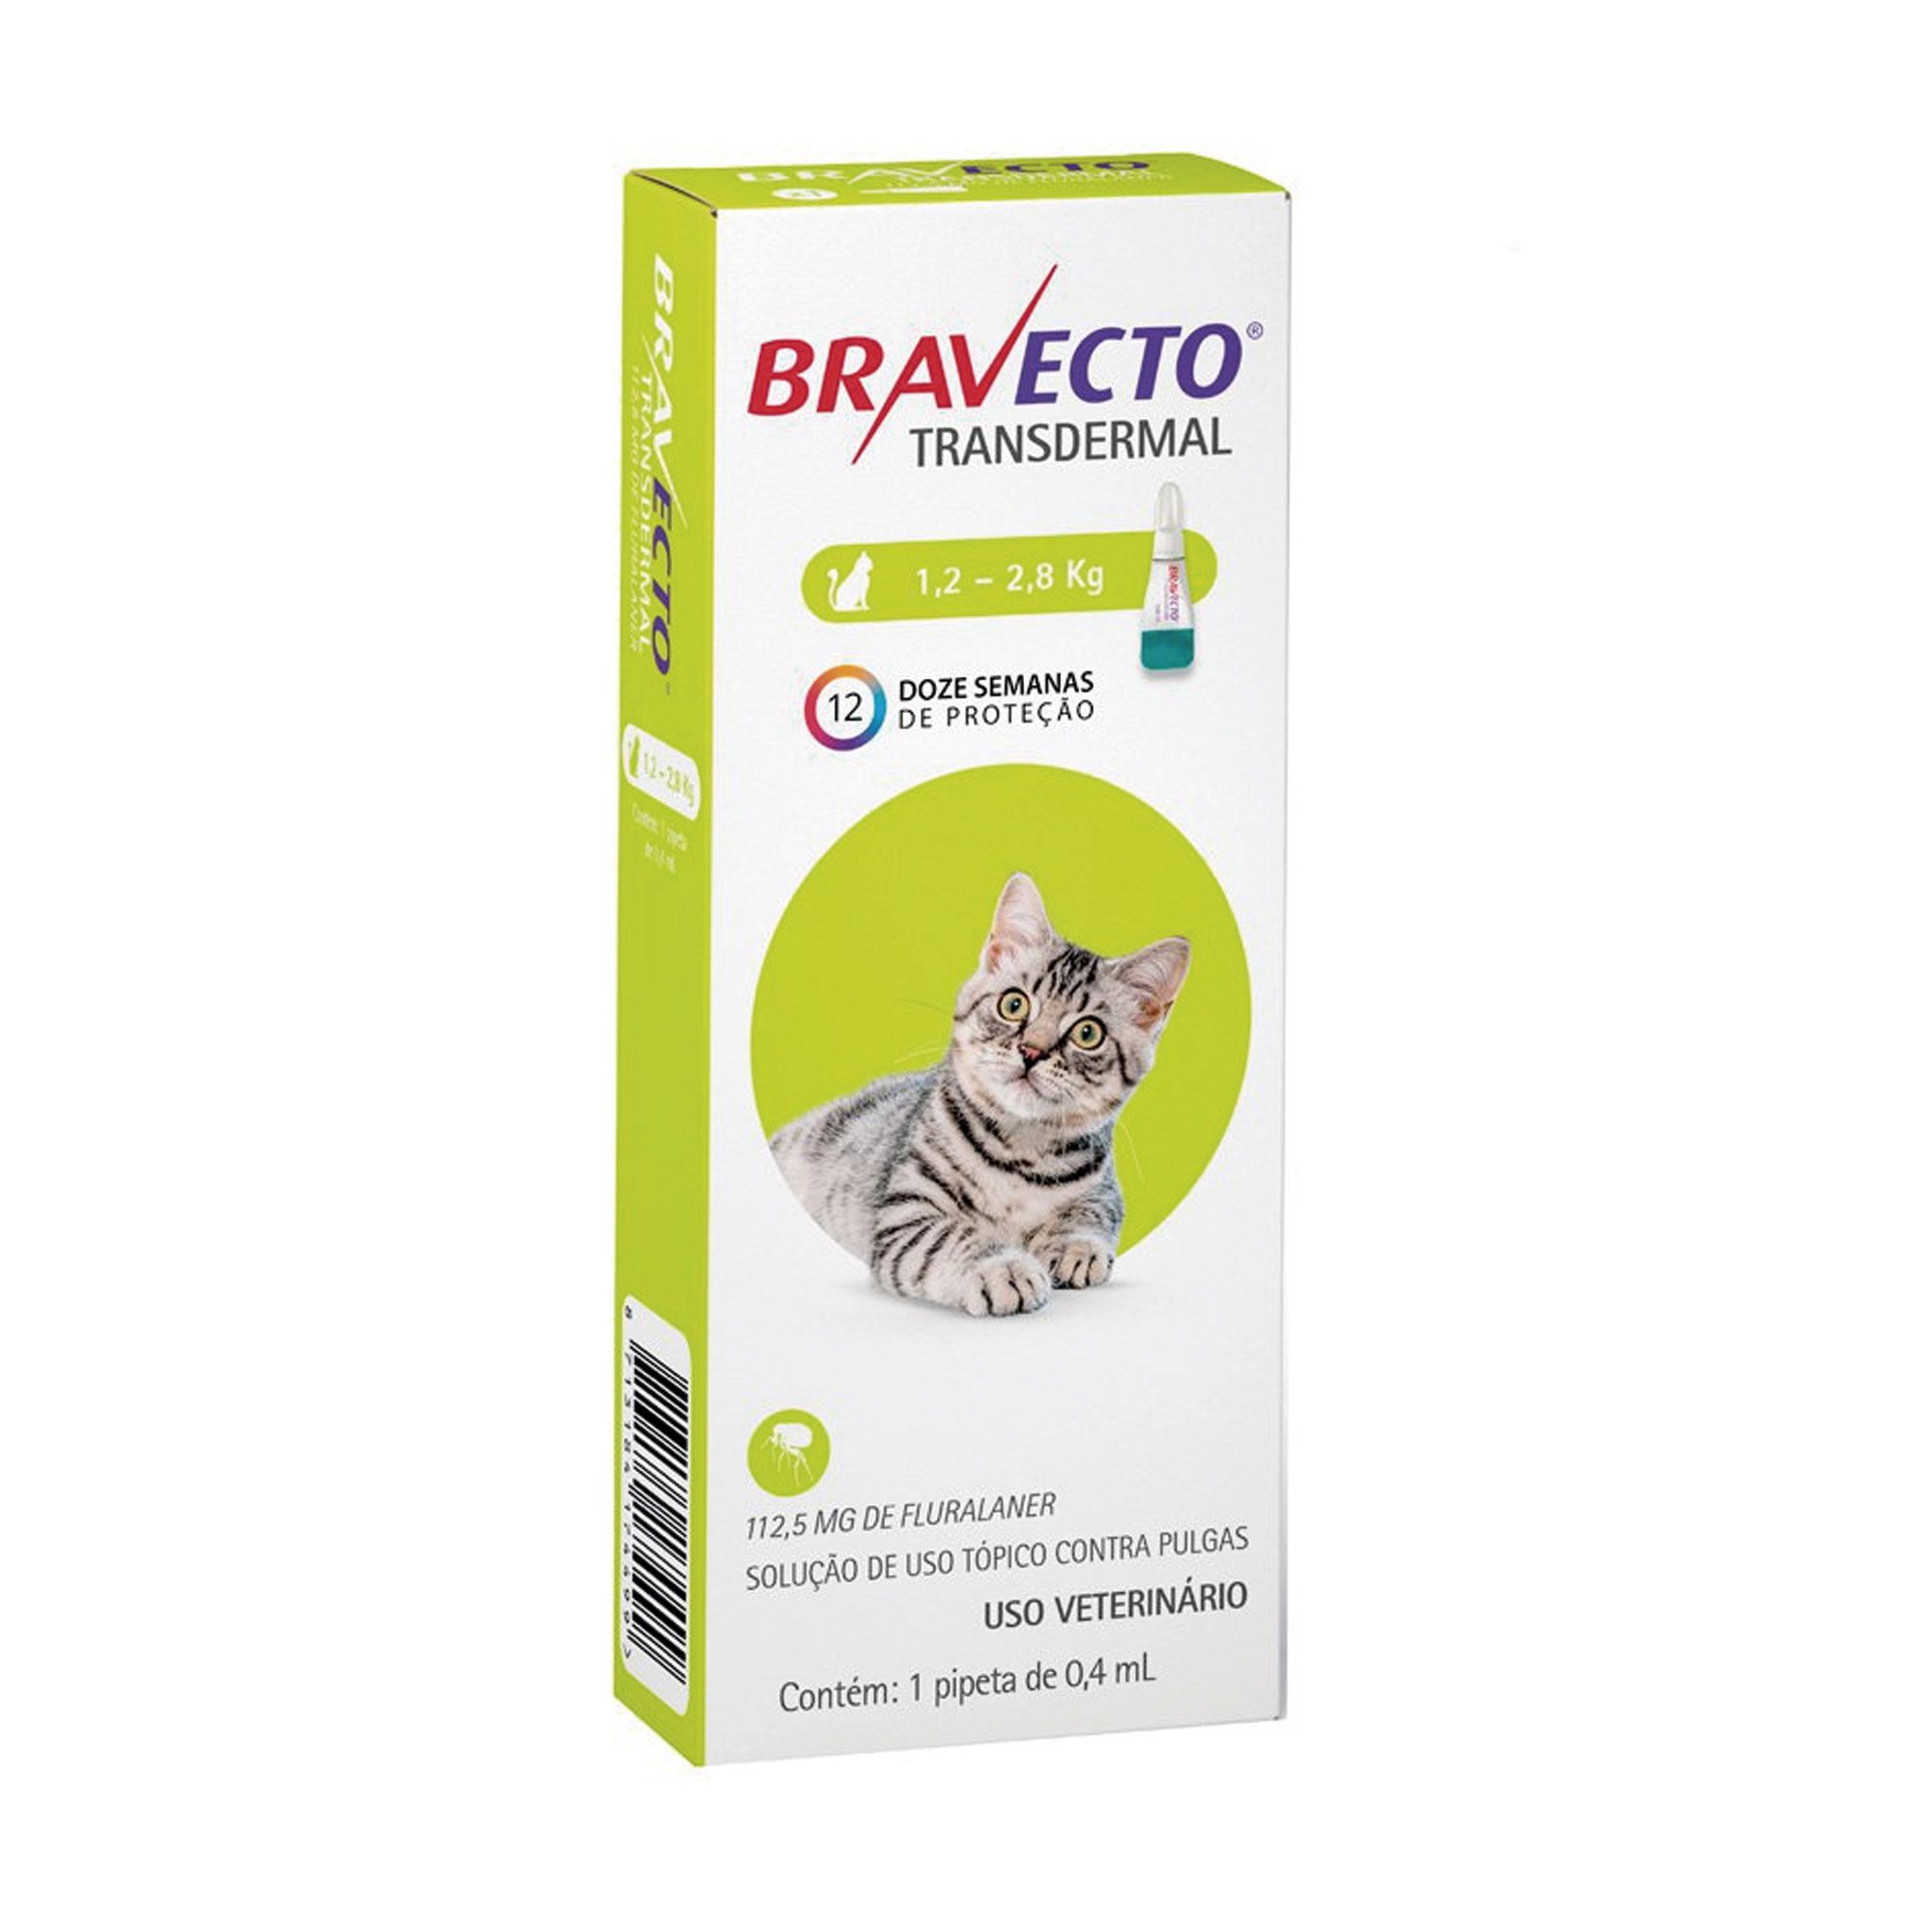 Bravecto Antipulgas Para Gatos de 1,2 a 2,8 kg Transdermal